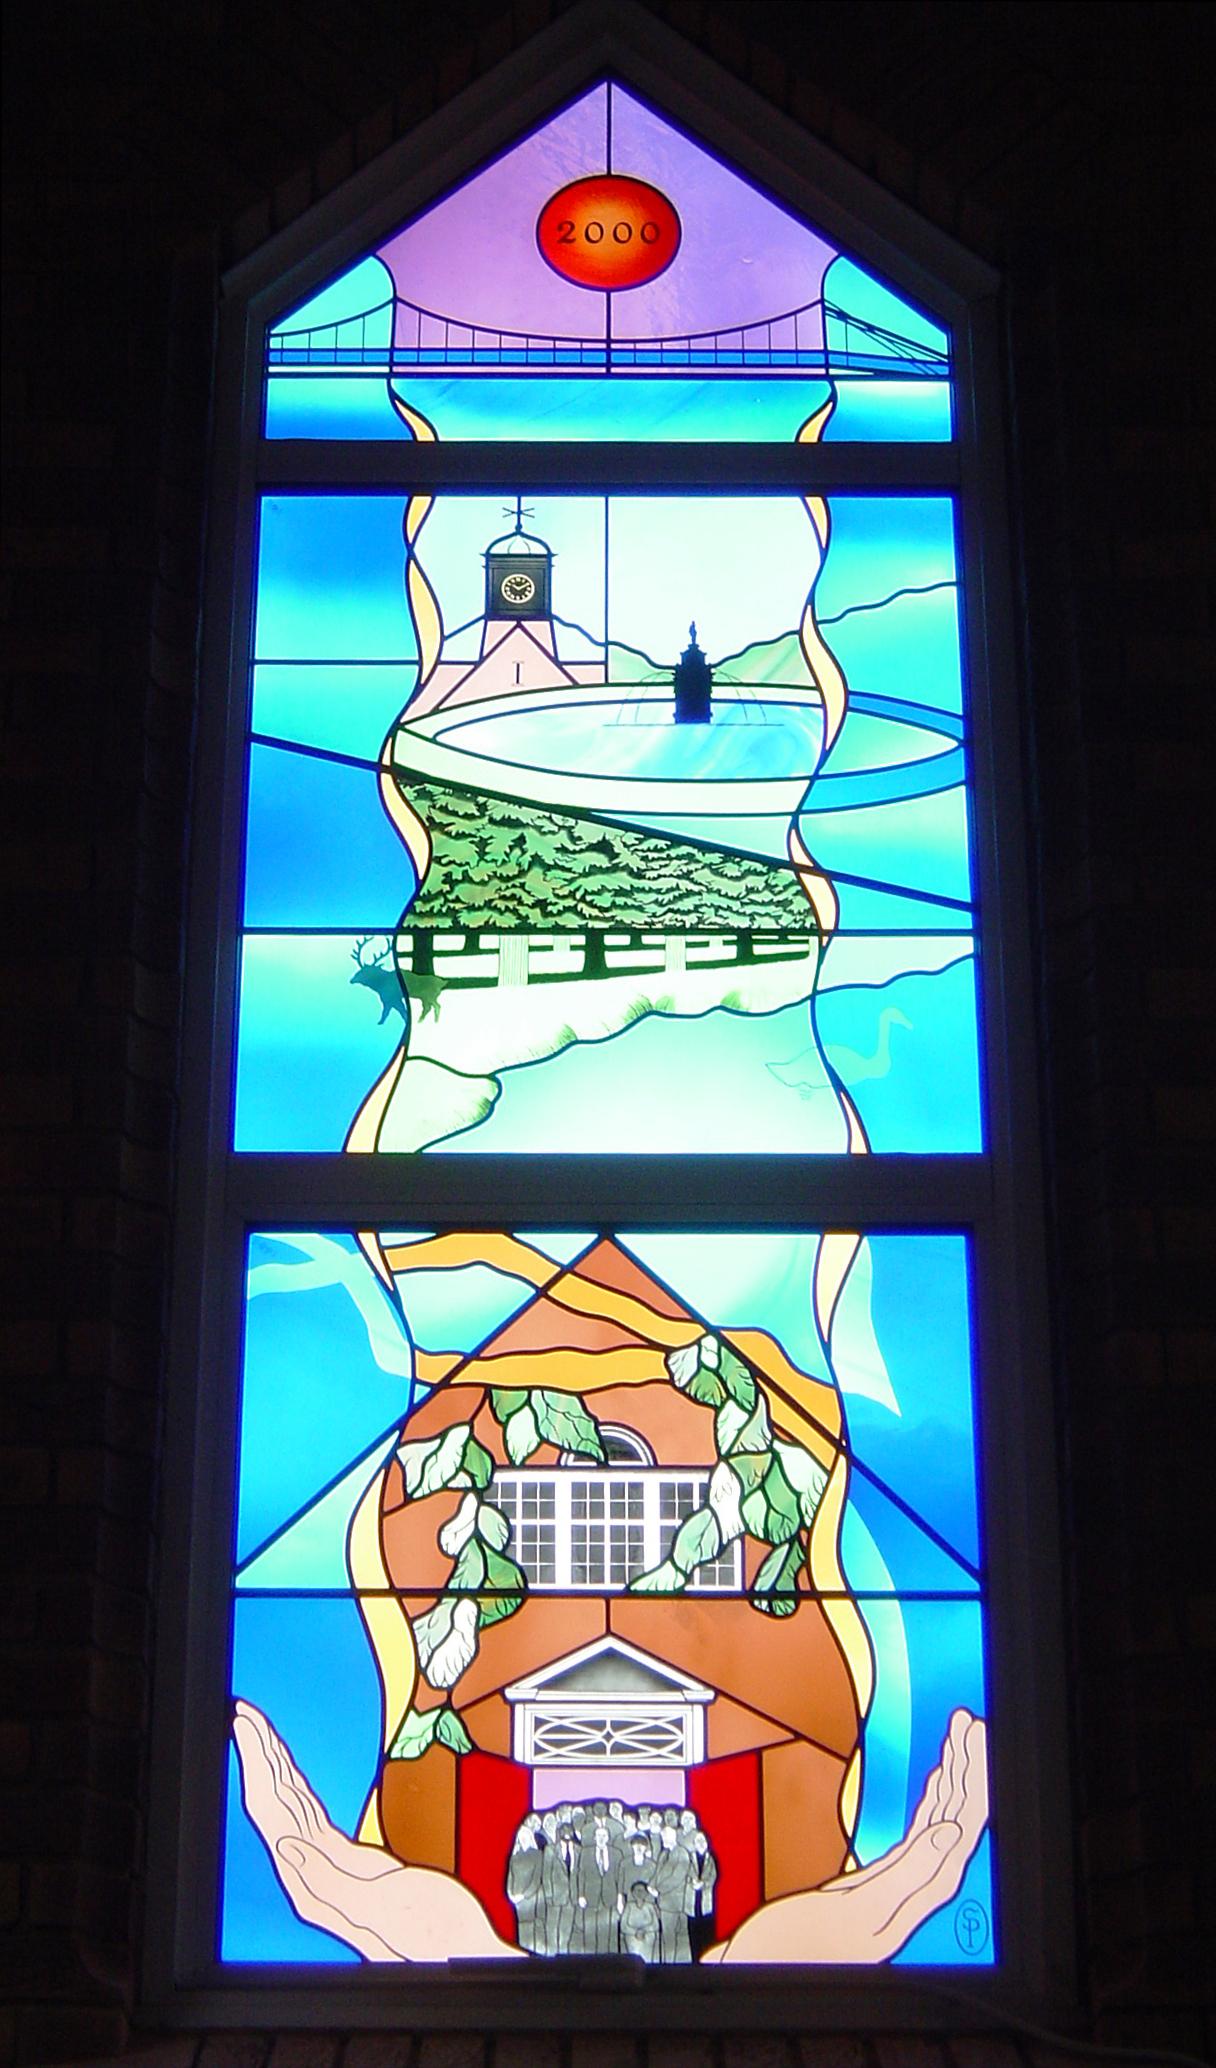 Millenium window in chapel, Teddington Memorial Hospital, Middlesex.